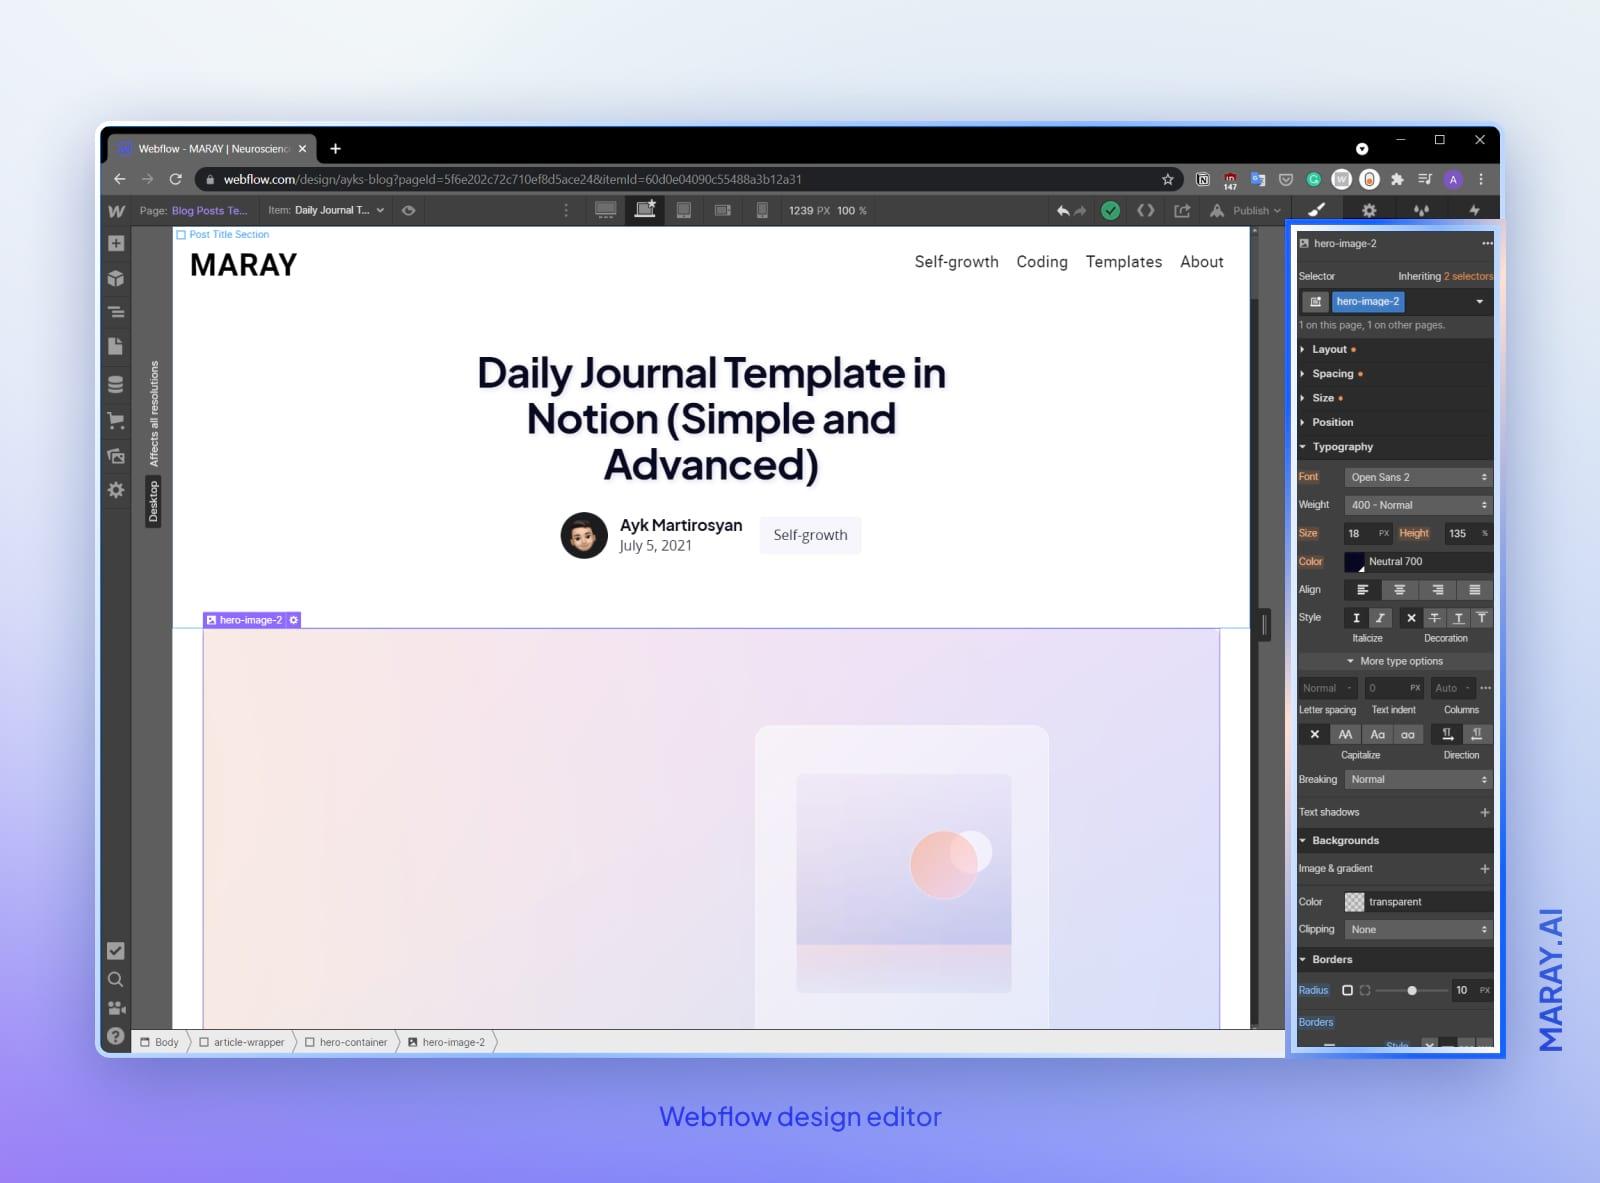 Webflow editor interface showing maray.ai blog.